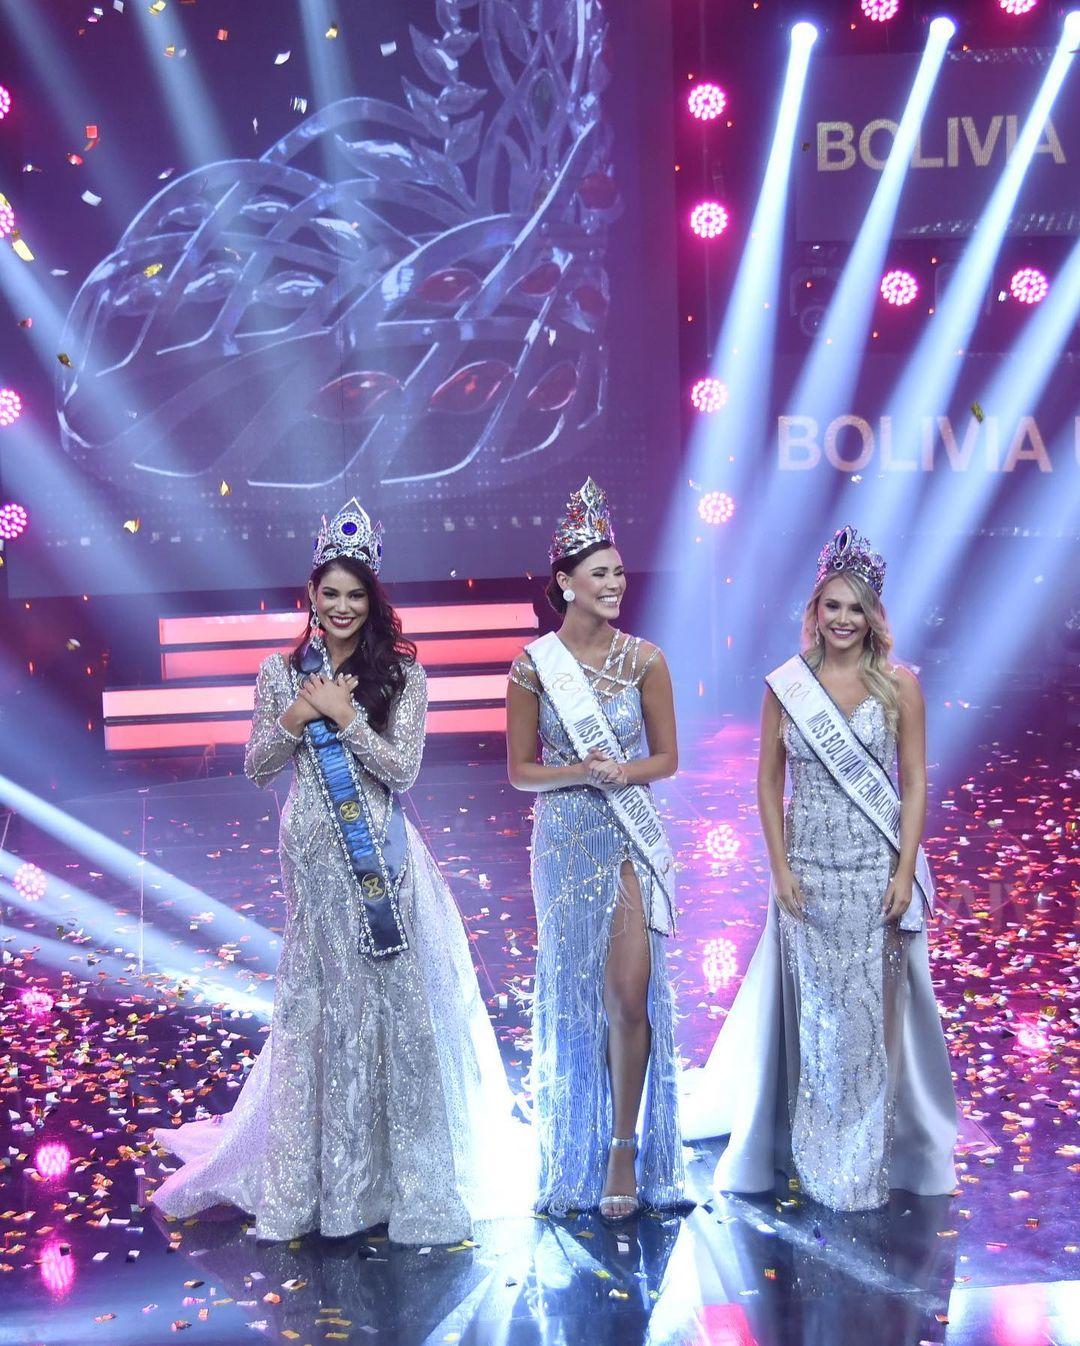 miss la paz vence miss bolivia 2020. 2ou34zc6